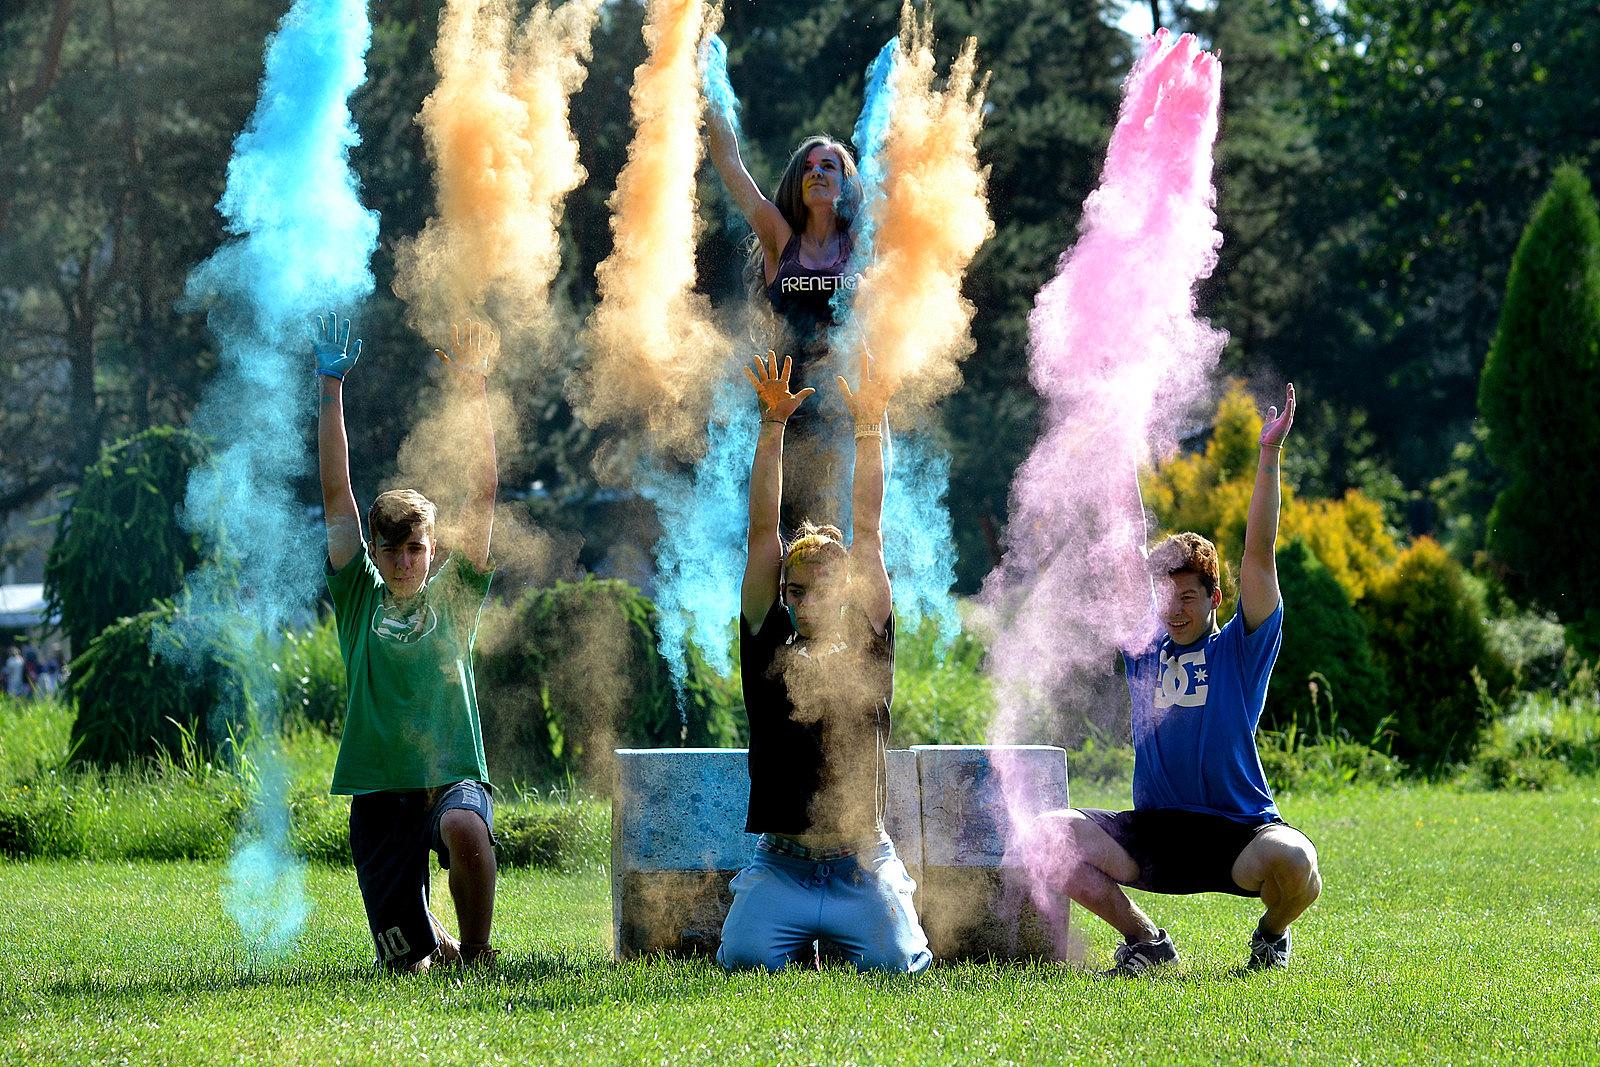 Nikon škola: farbám neujdeš & športová fotka